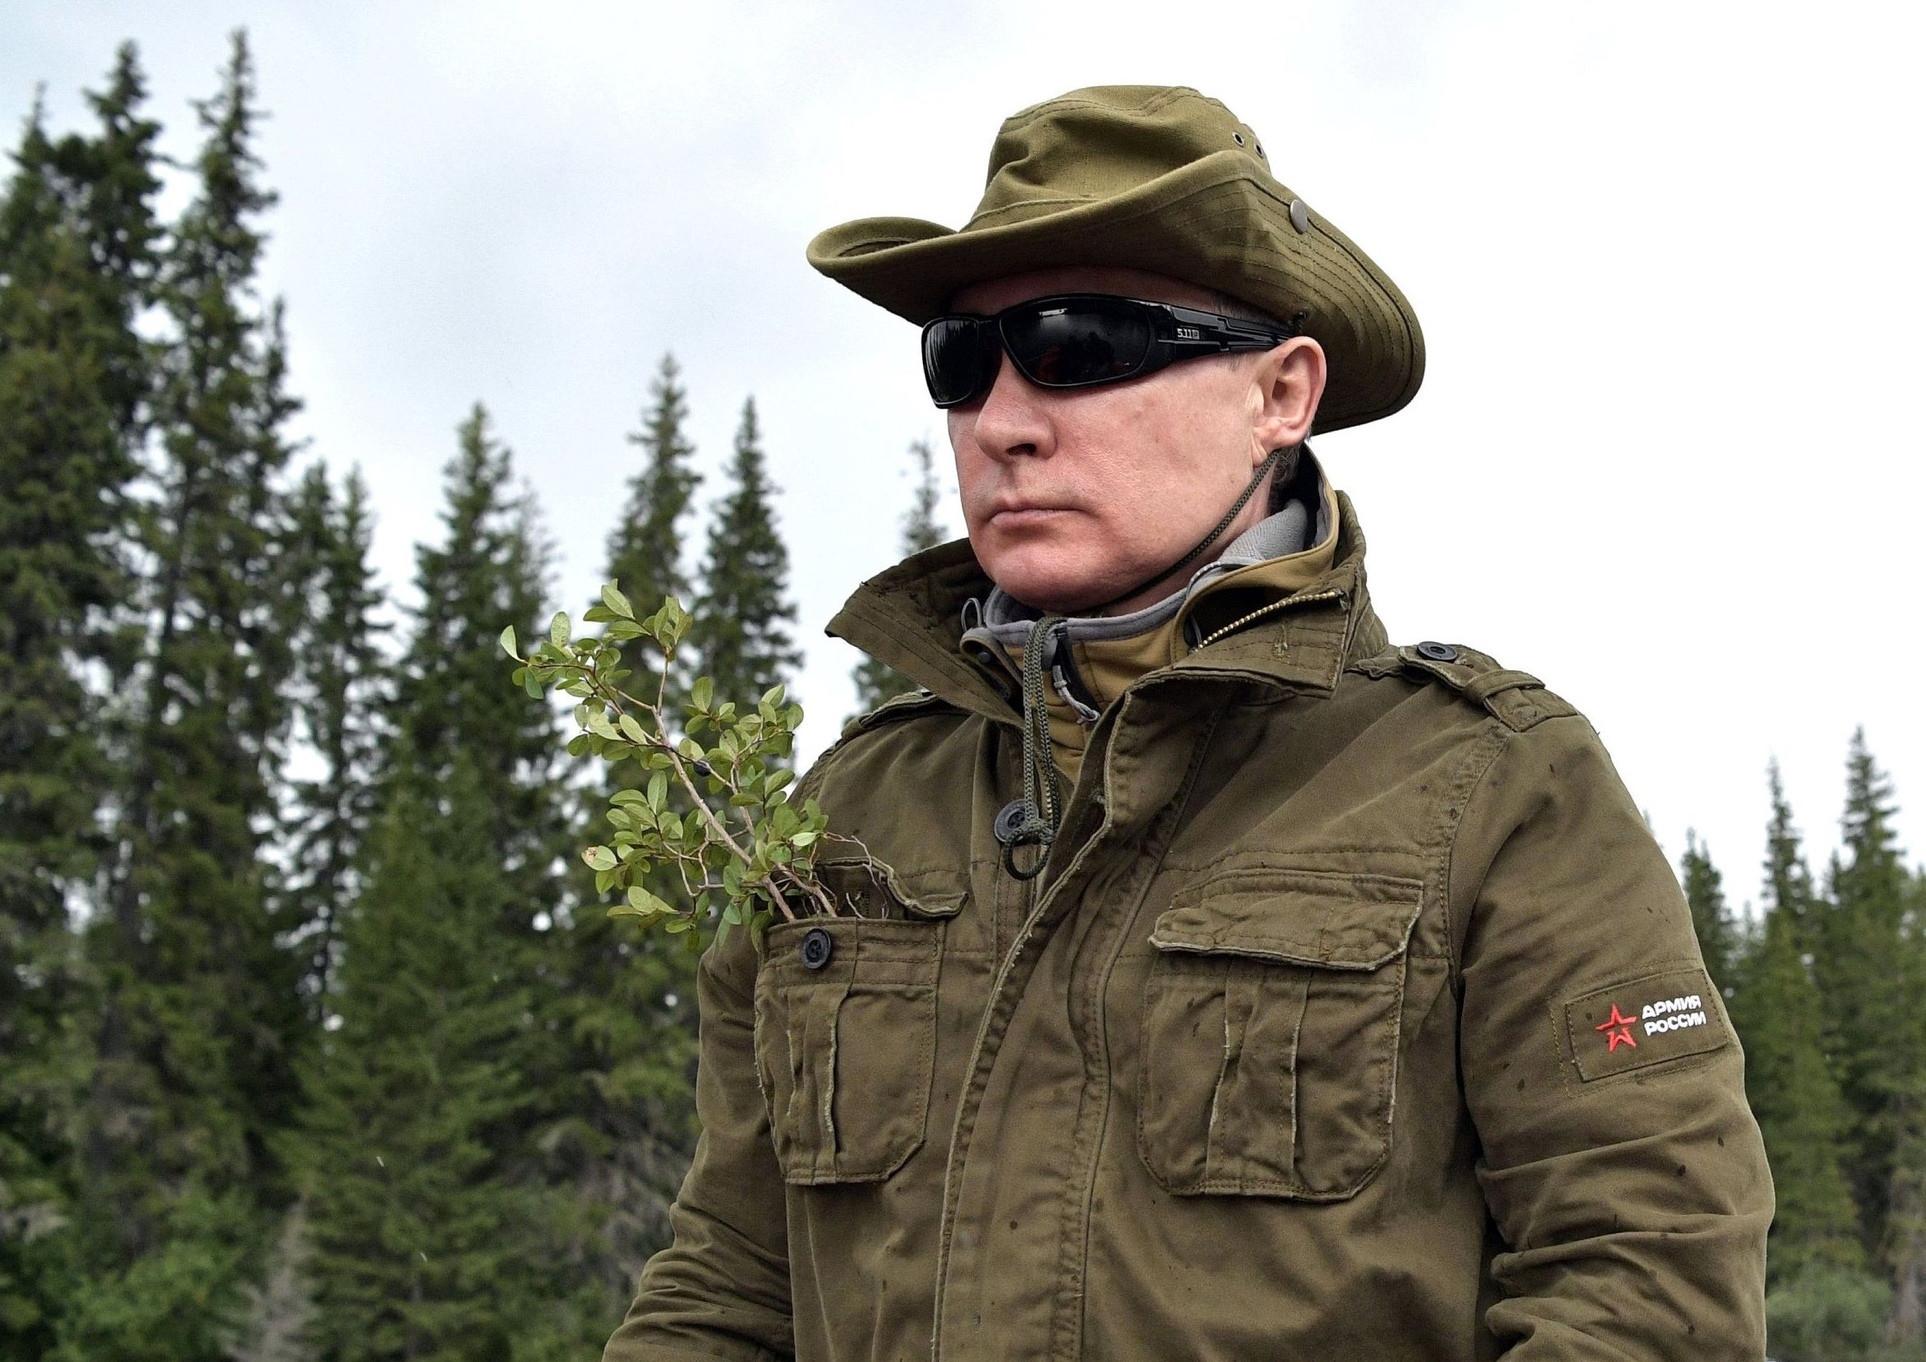 Путин объявил военные сборы